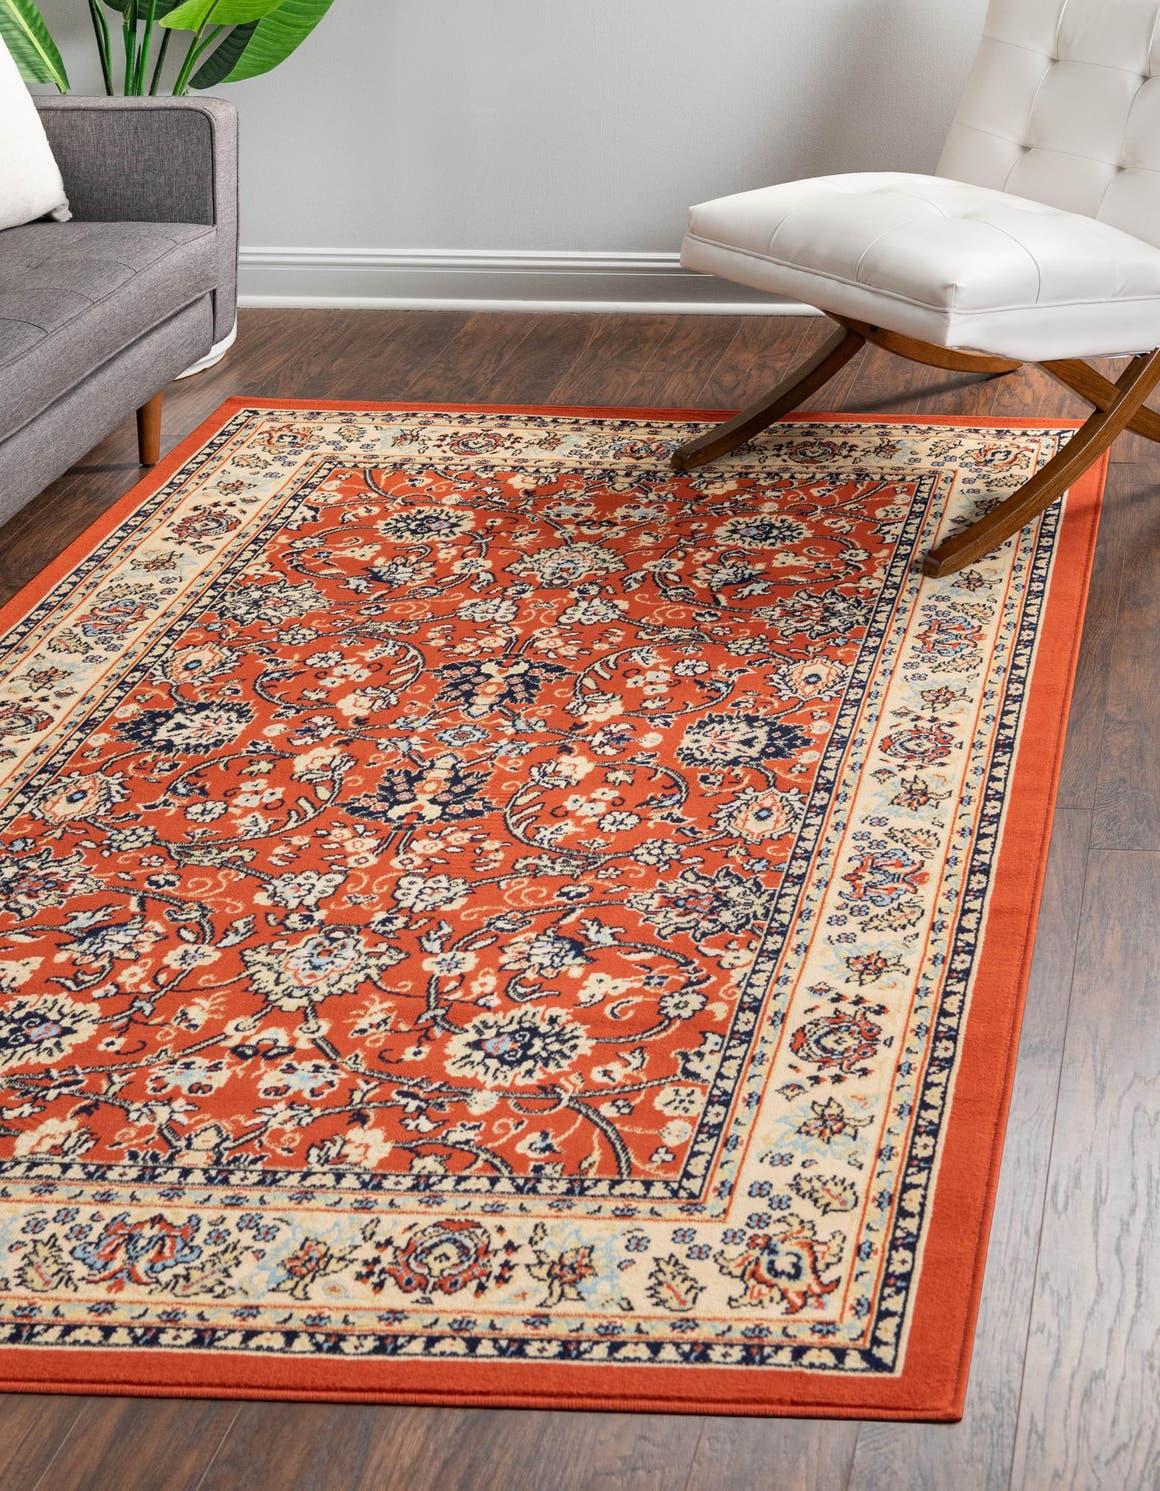 8' x 10' Kashan Design Rug main image